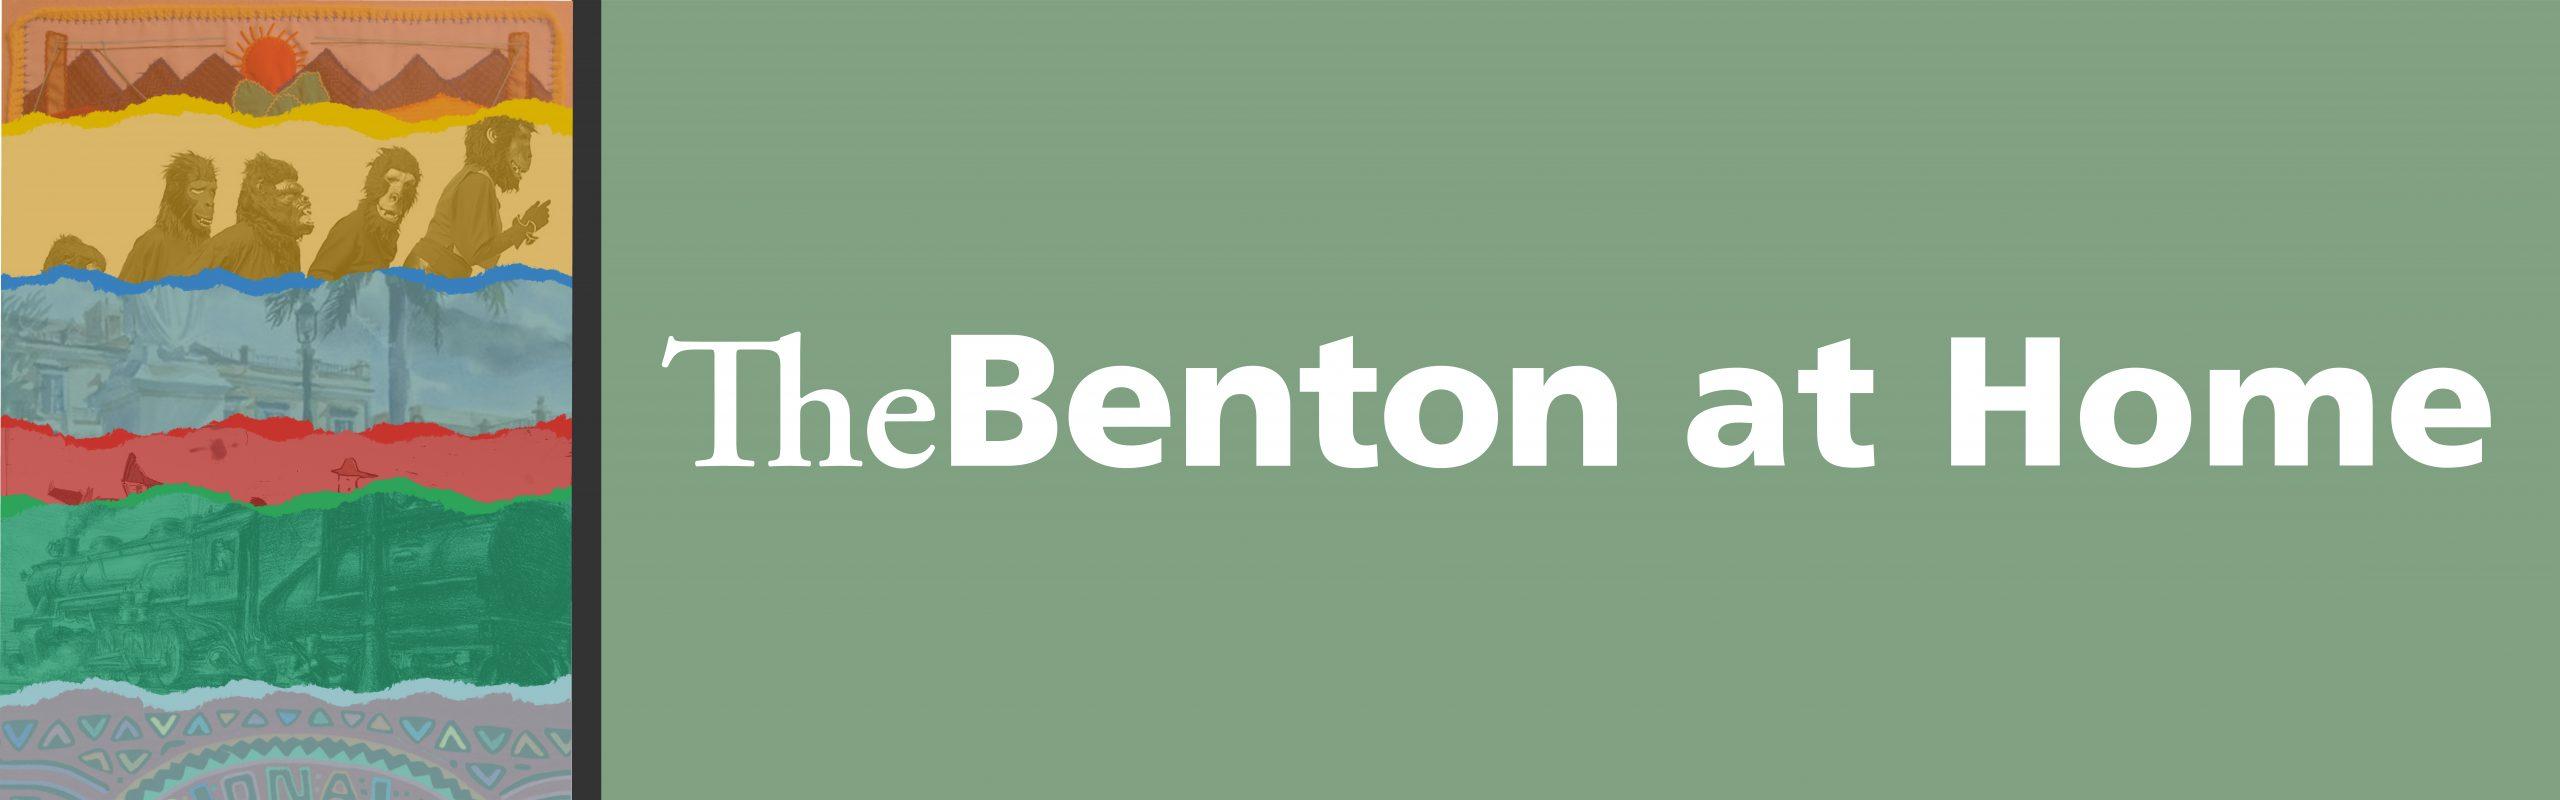 The Benton at Home